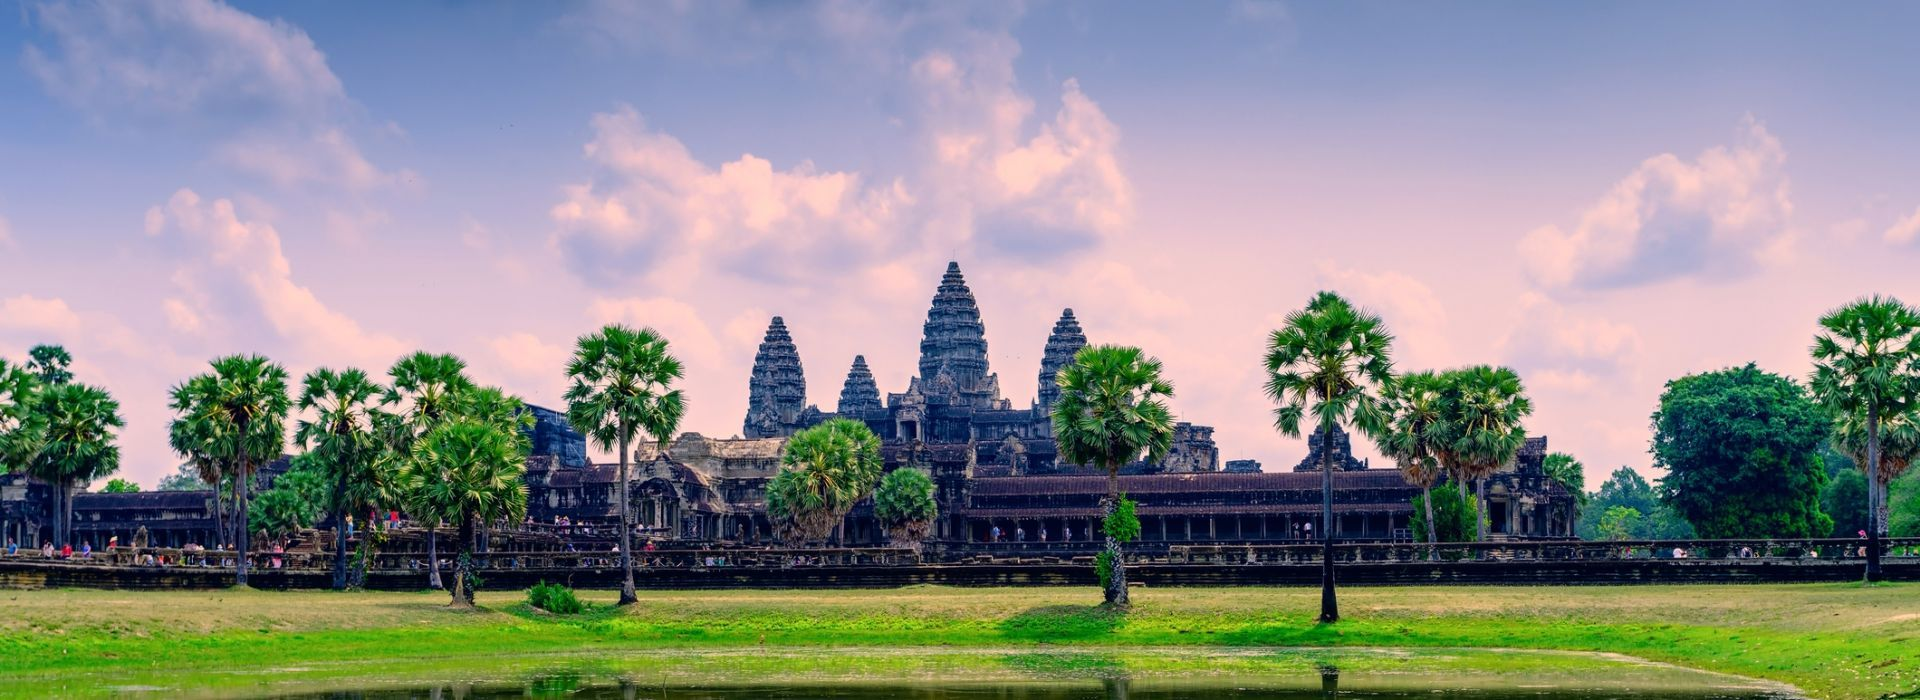 Adventure Tours in Angkor Wat